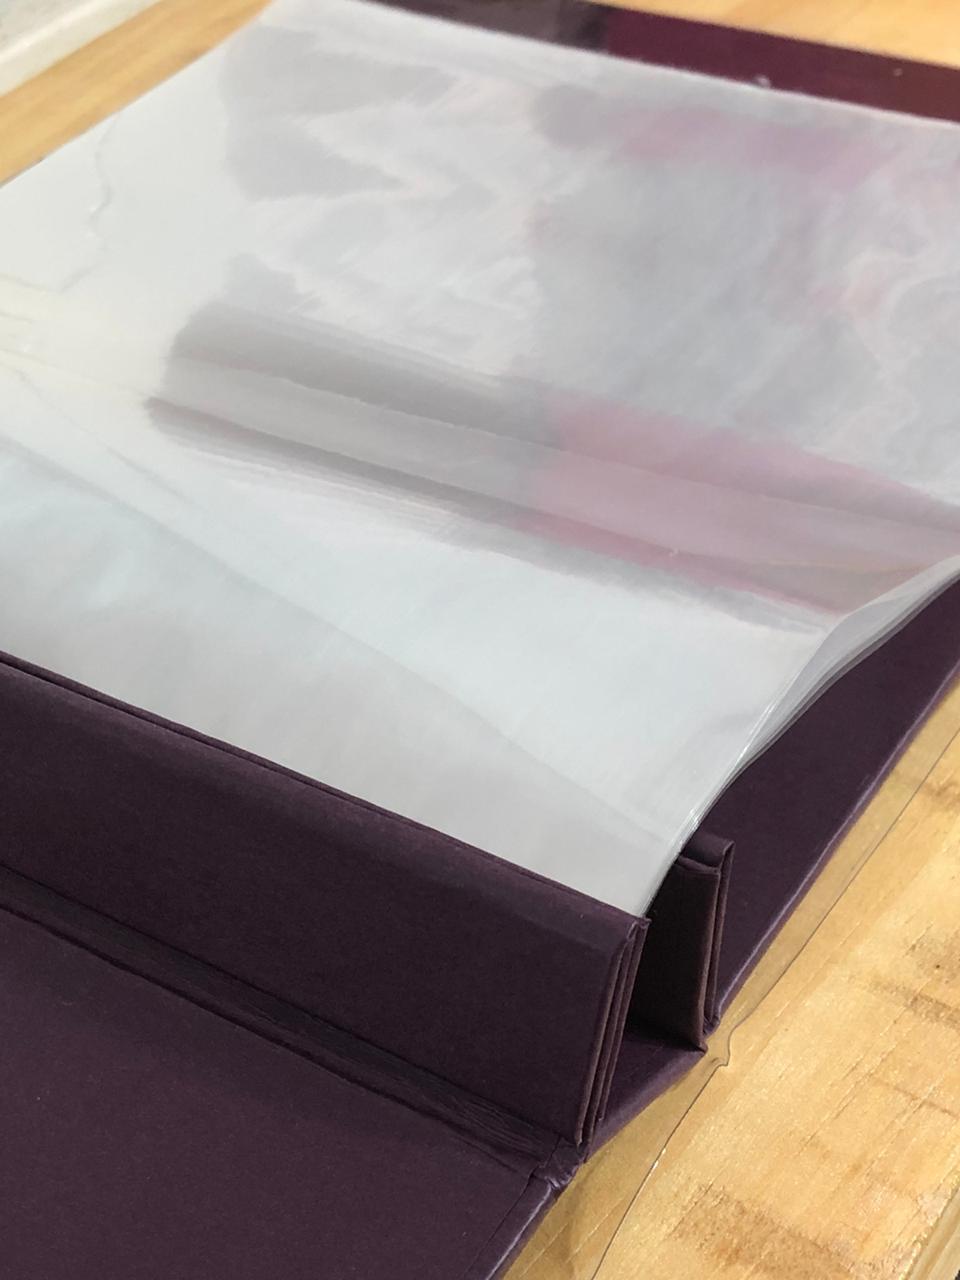 Album Scrapbook M Violeta - Oficina do Papel (0603004)